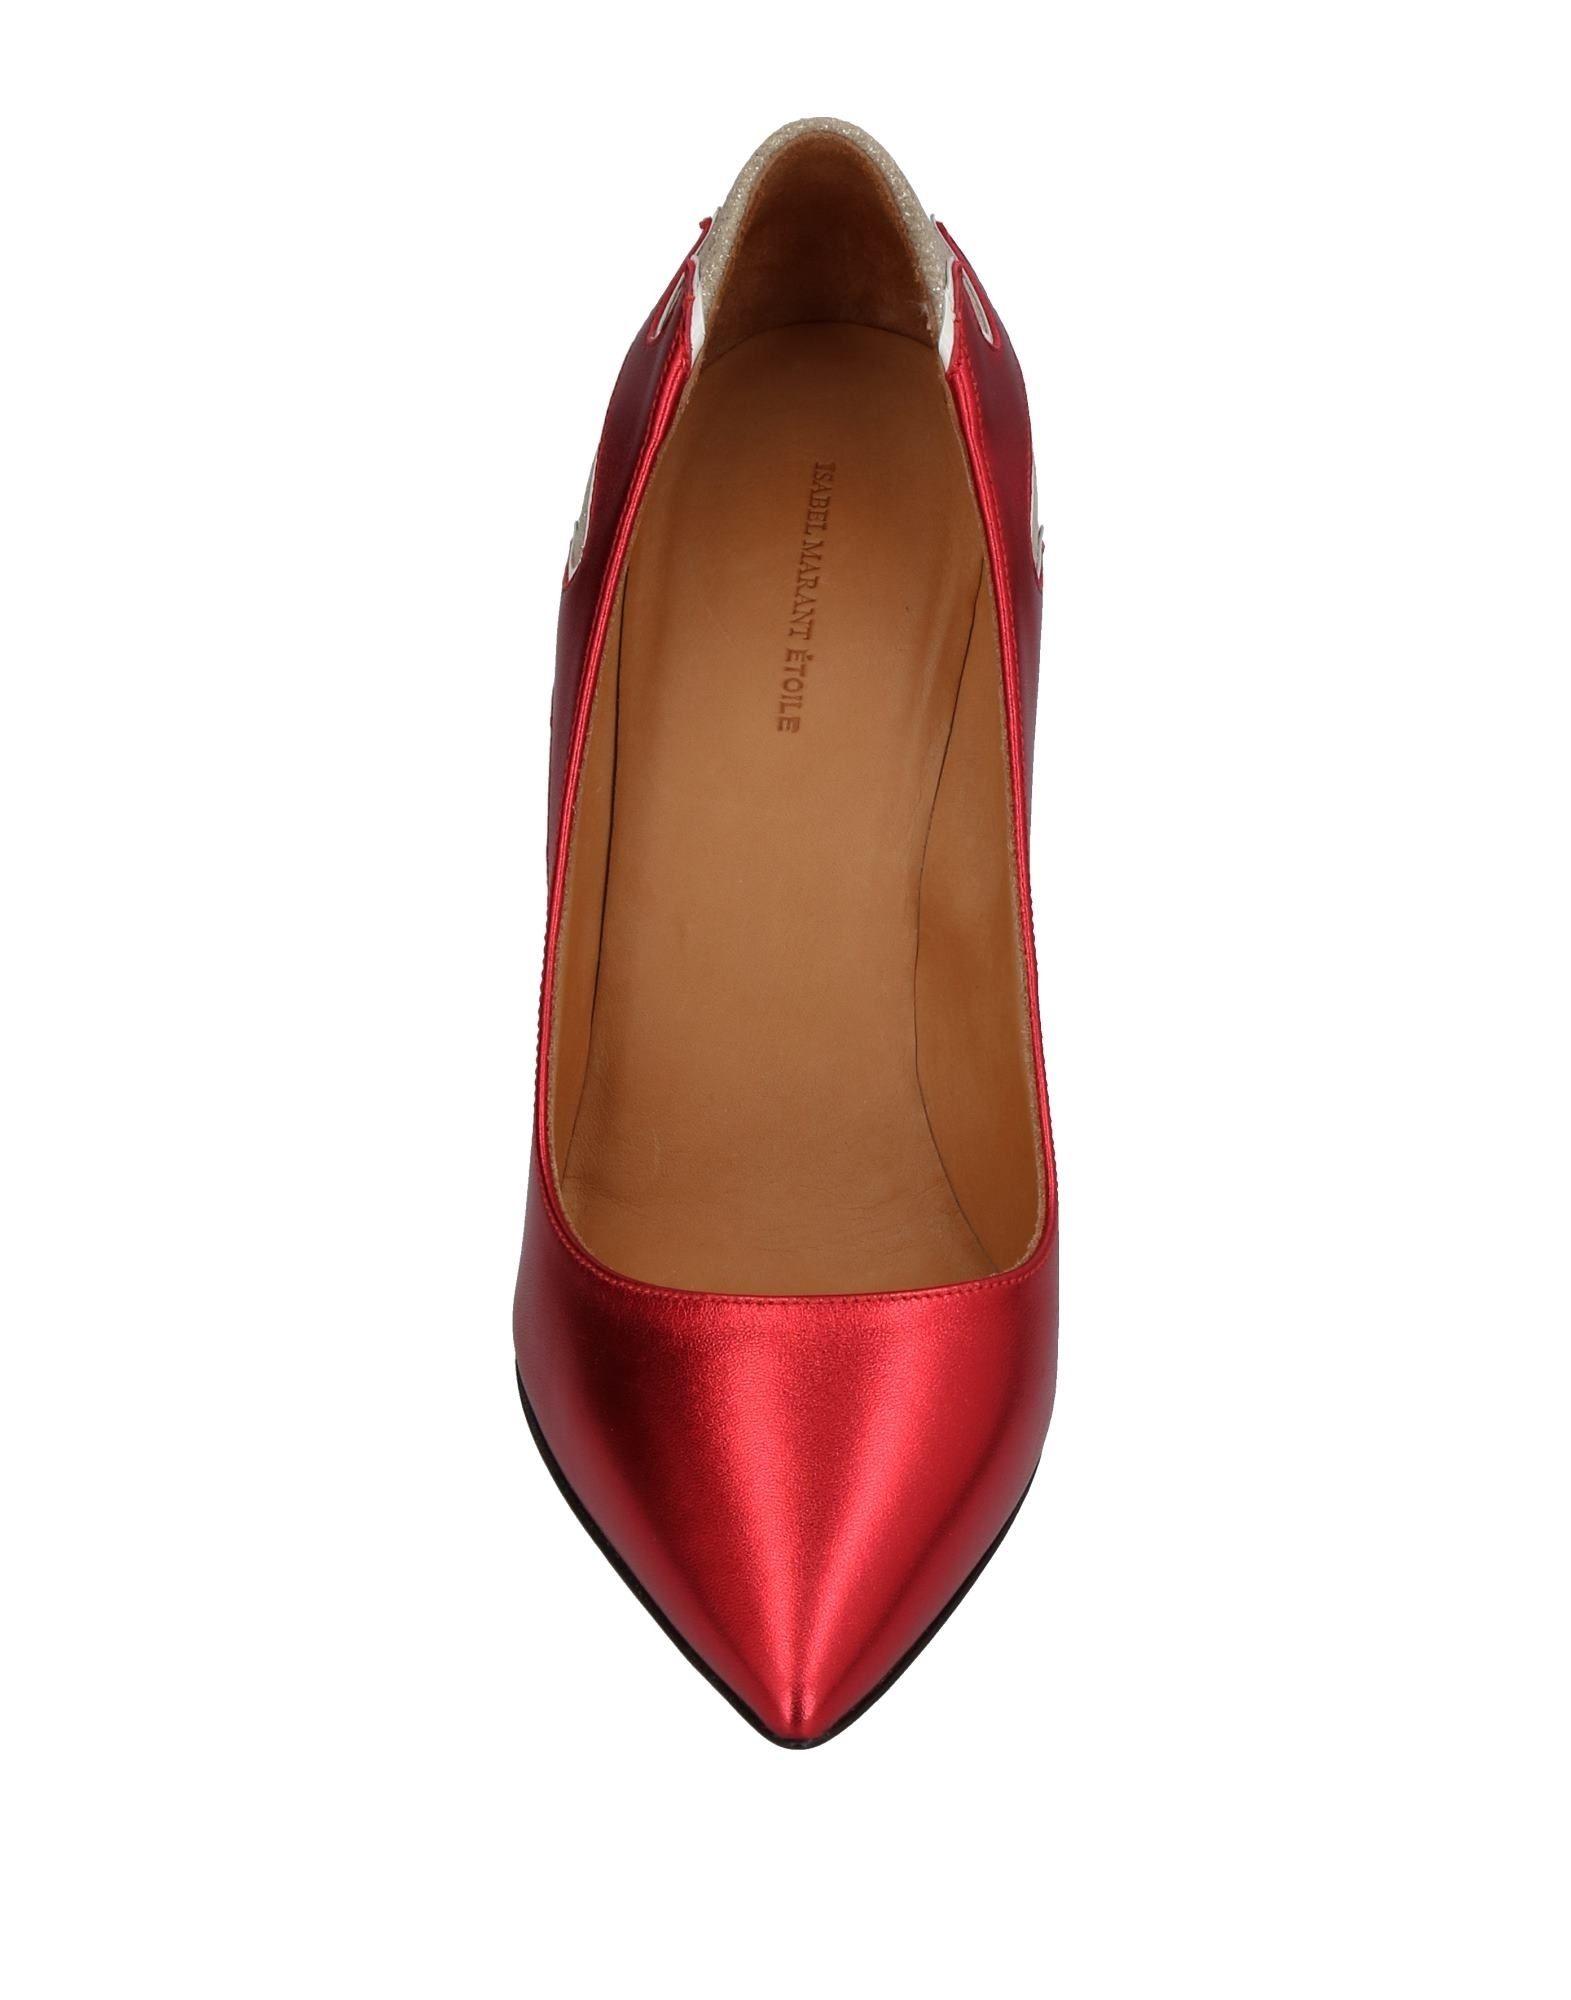 Isabel Marant Étoile Pumps  Damen  Pumps 11384797XW Neue Schuhe ef3bea